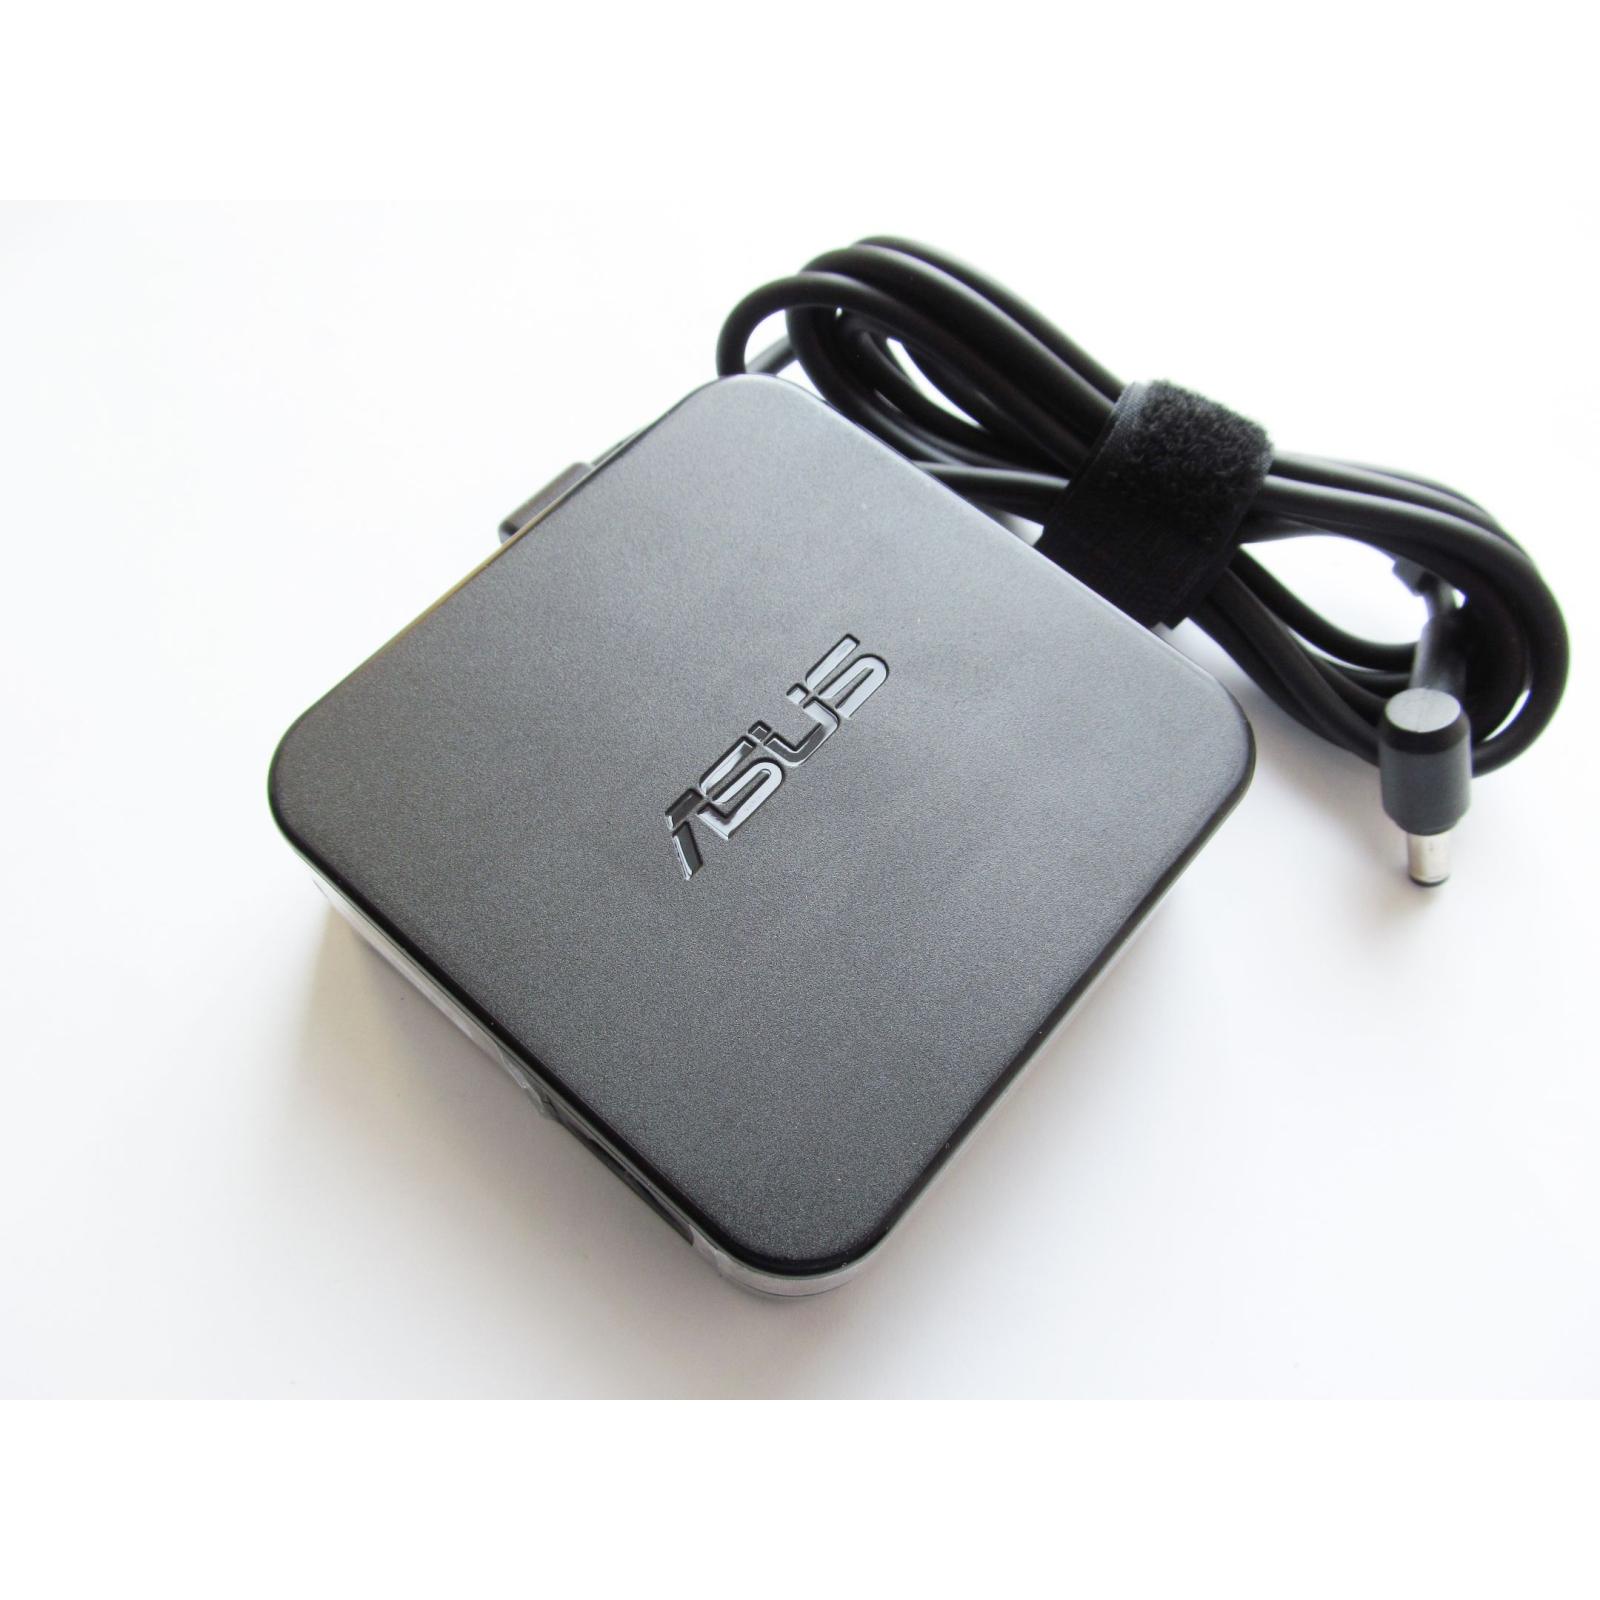 Блок питания к ноутбуку ASUS 90W 19V, 4.74A, разъем 5.5/2.5 (ADP-90YD / A40264)